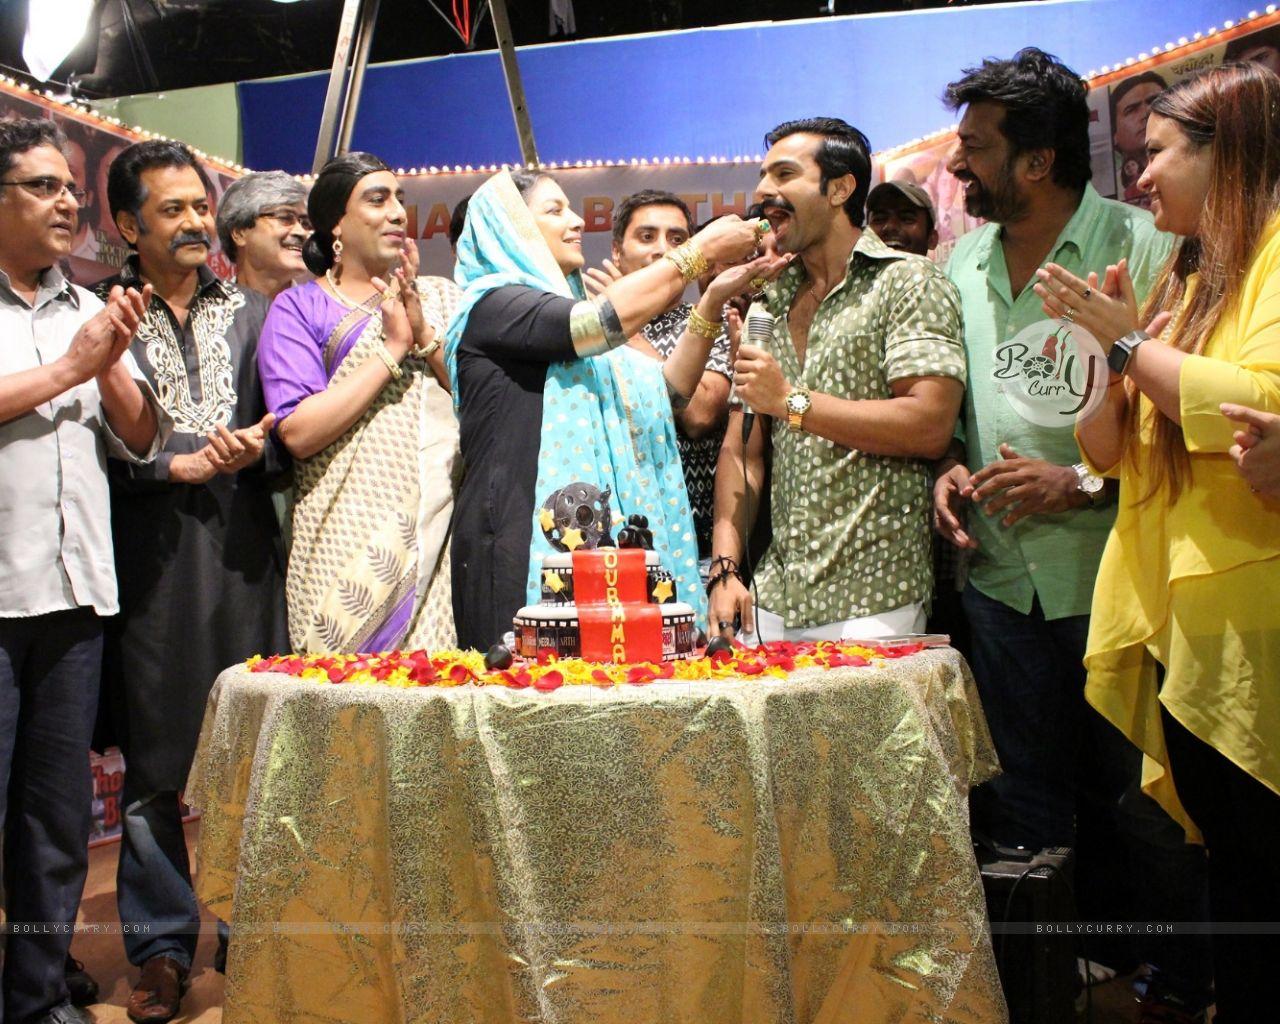 Celebs at Shabana Azmi's birthday bash on the sets of Amma (420824) size:1280x1024